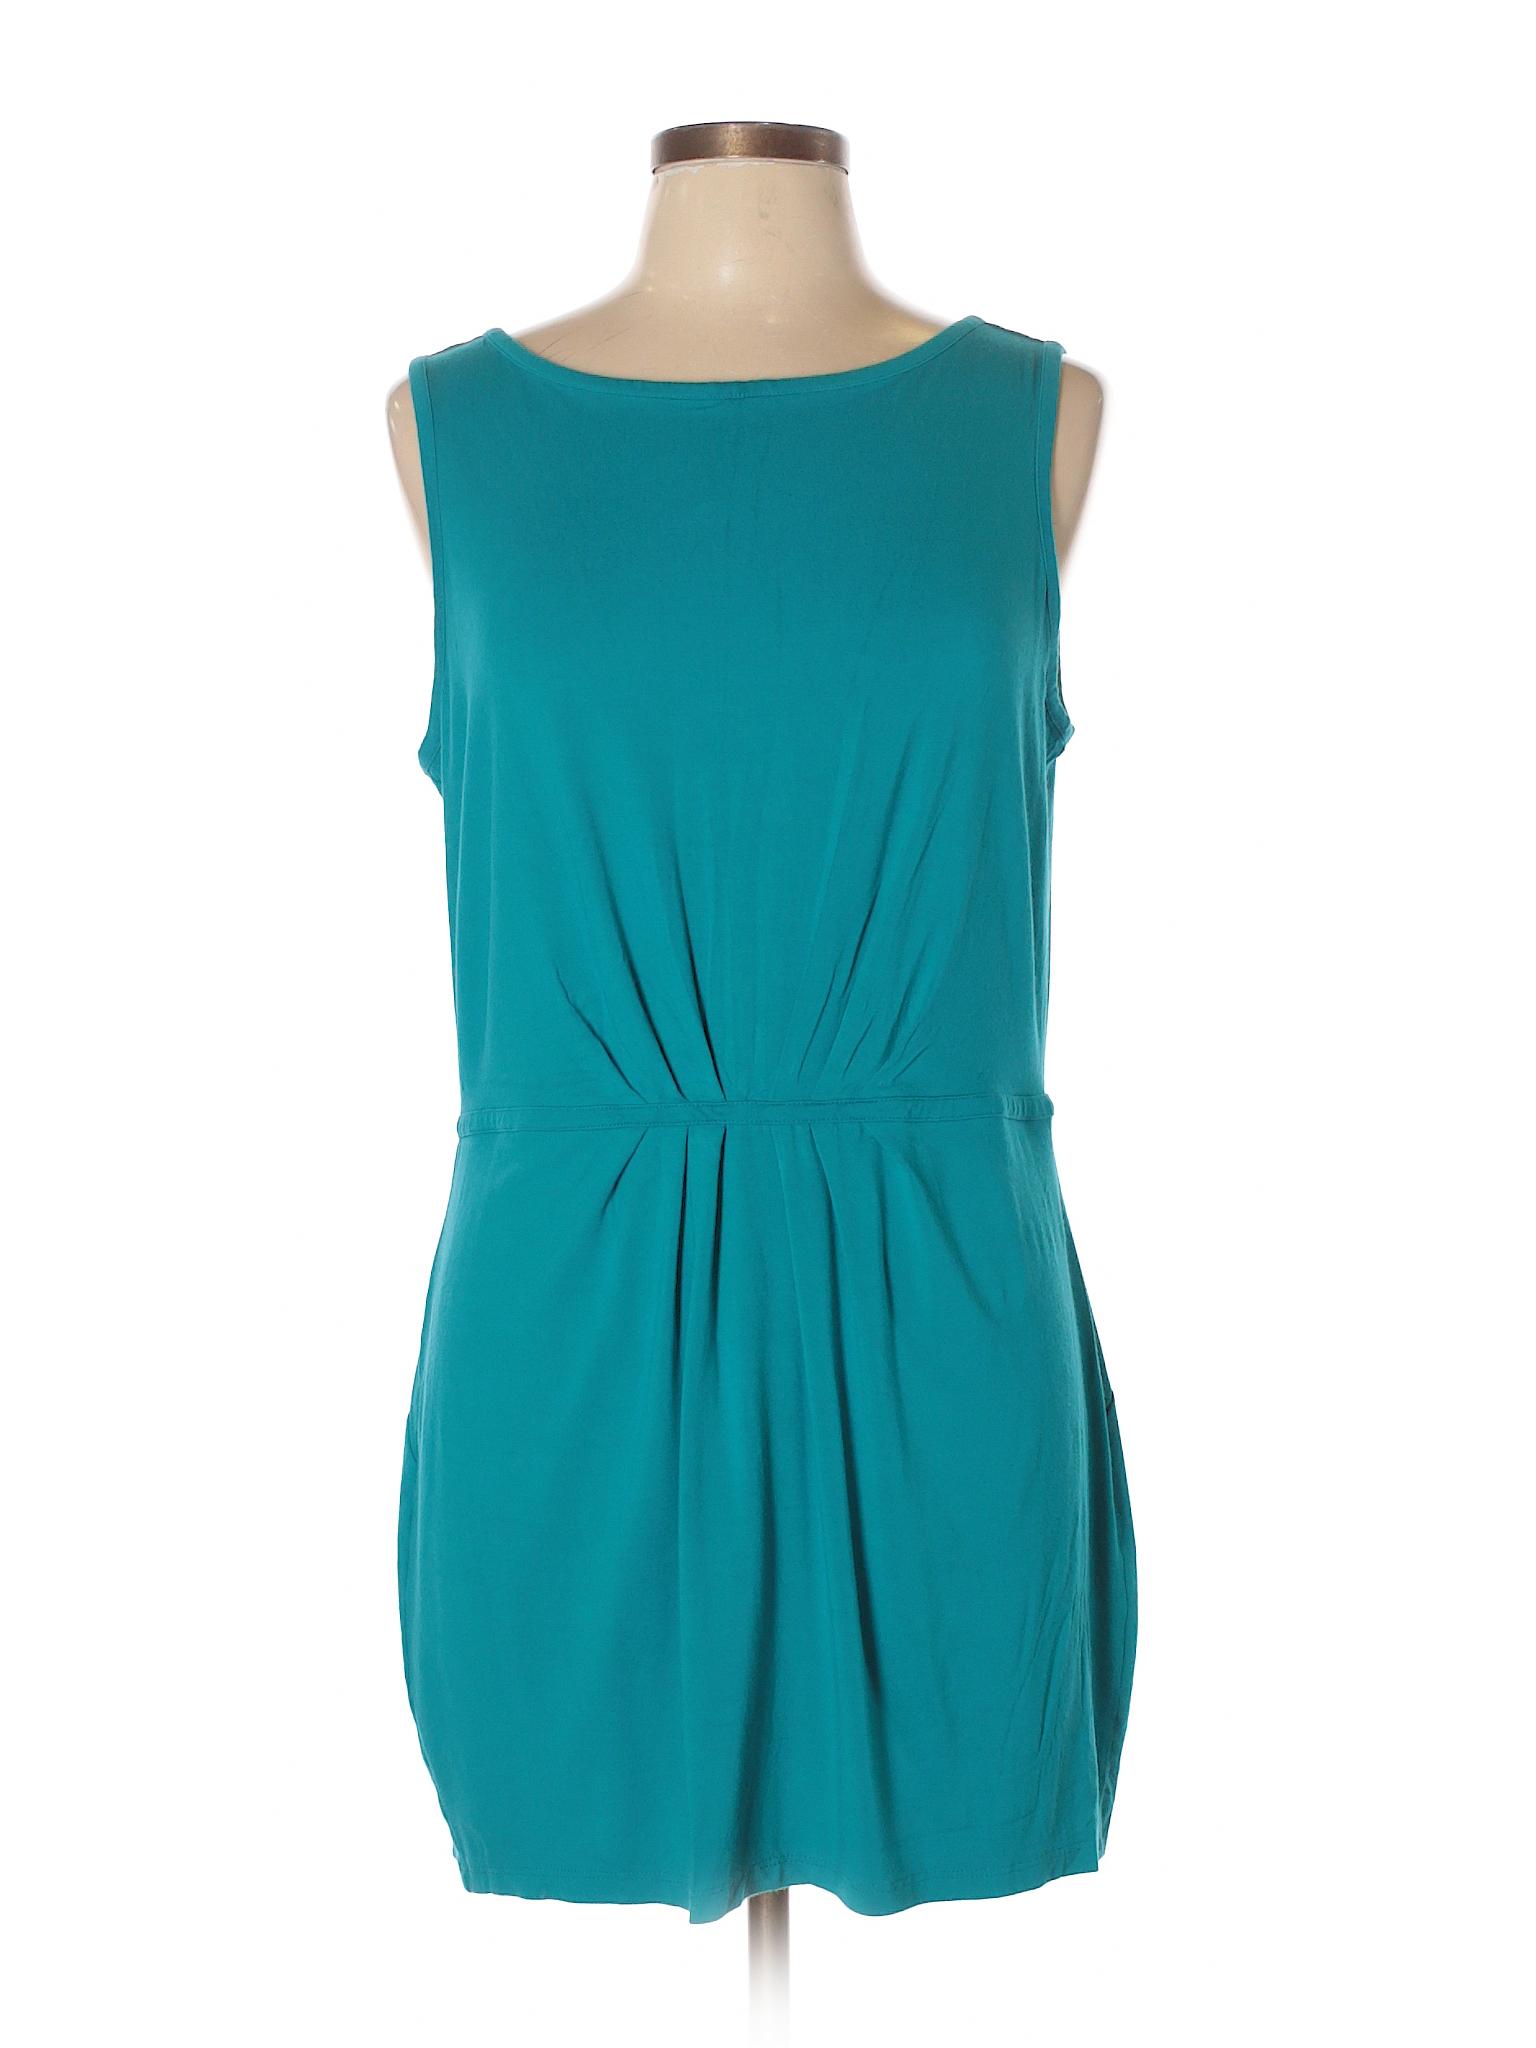 Ann Selling Ann Selling Casual Ann Selling Selling Taylor Dress Taylor Casual Ann Taylor Dress Taylor Dress Casual Casual A4dqRv